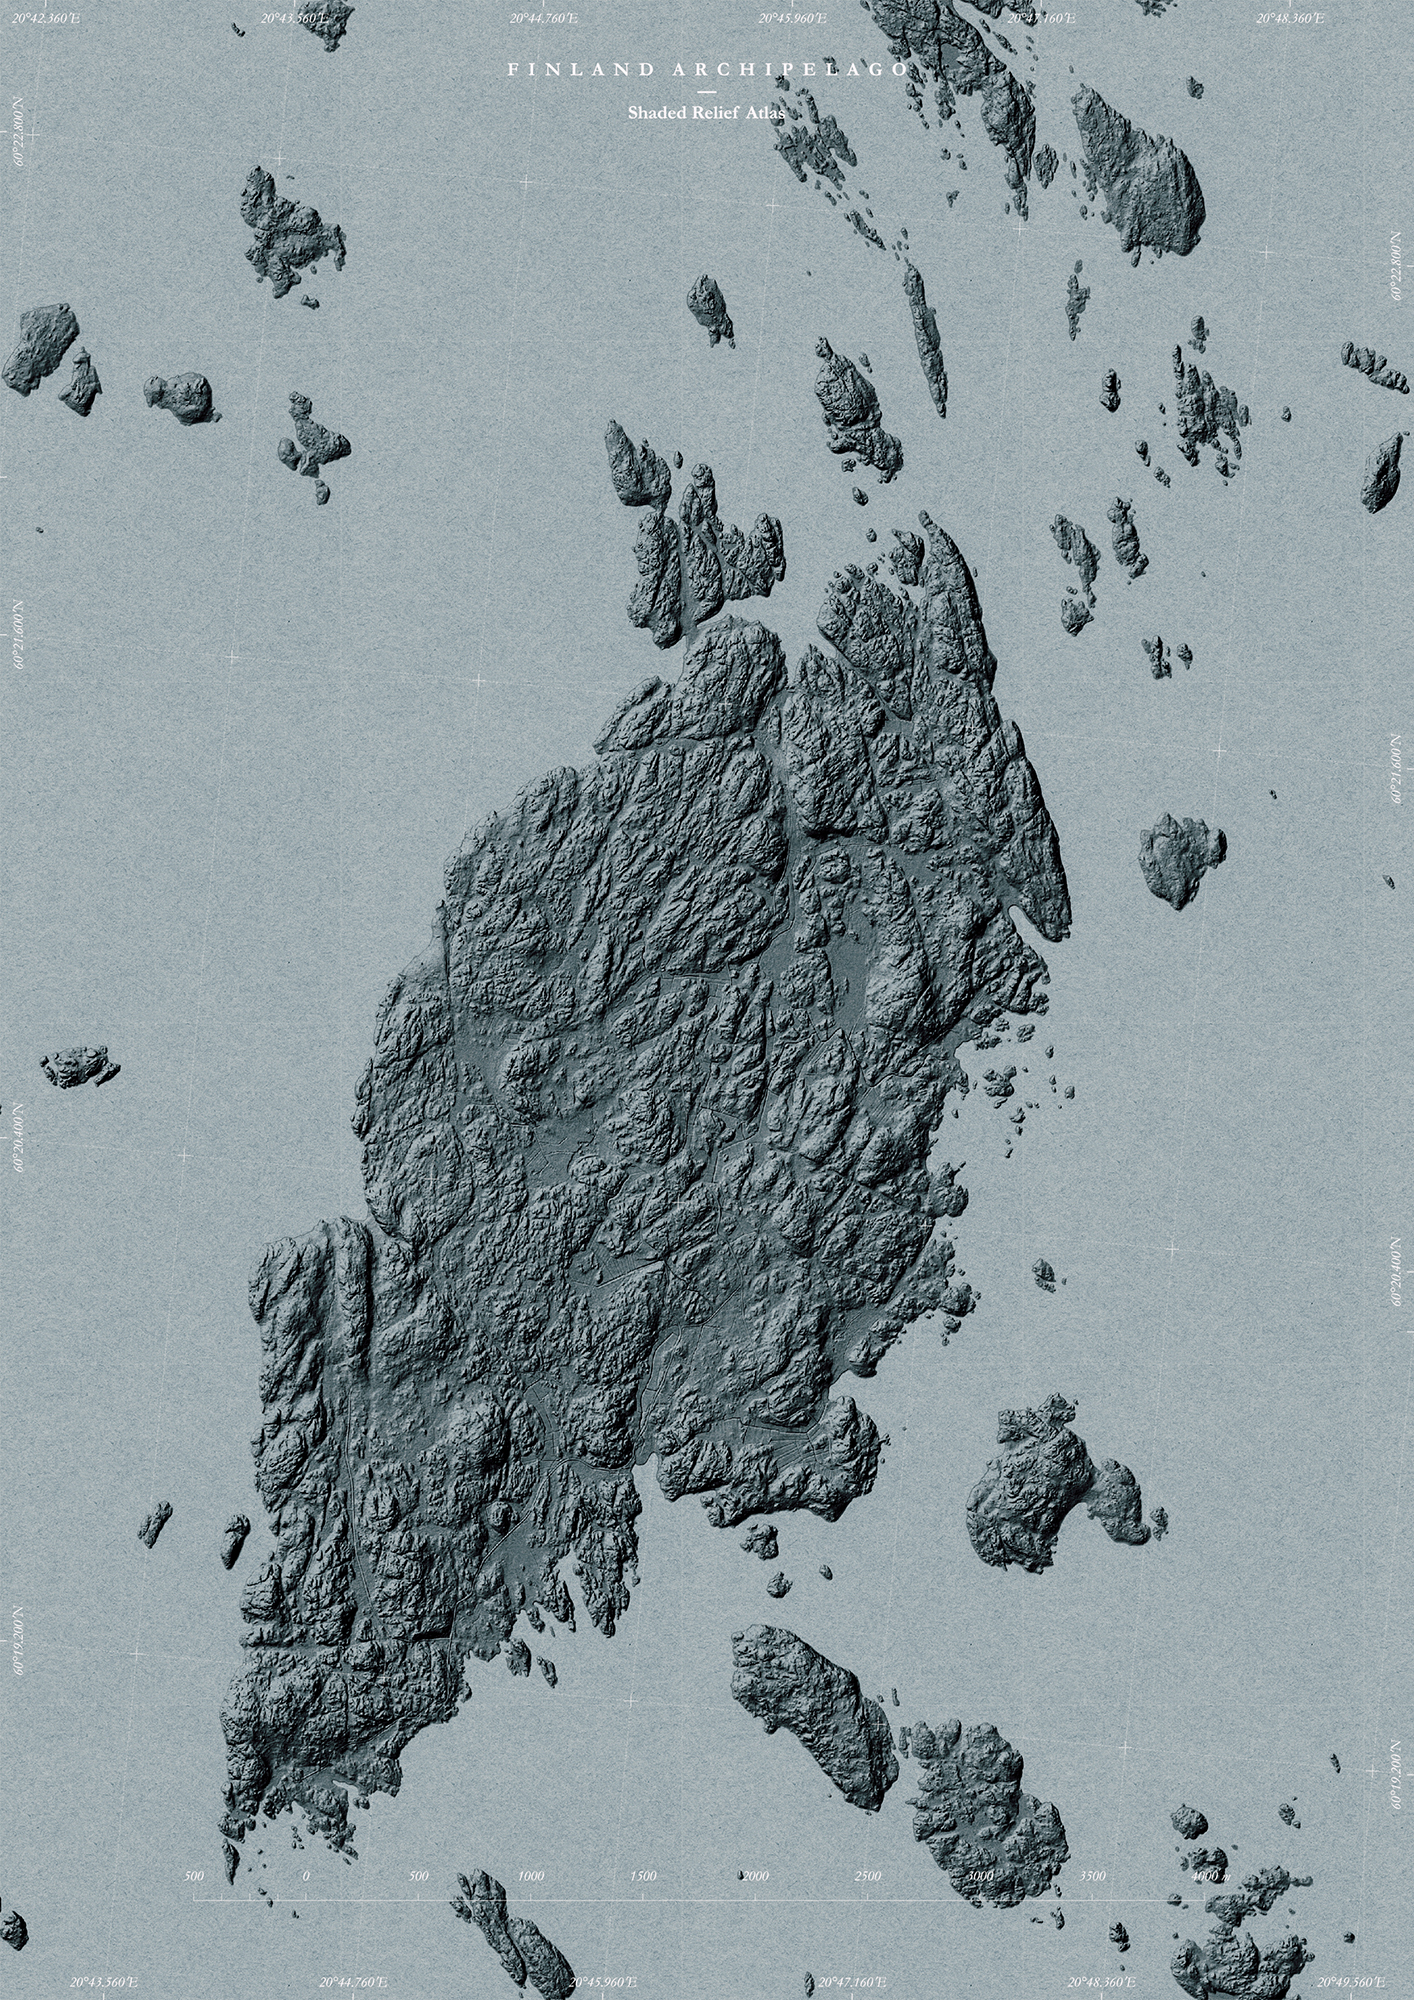 Archipelago Sea Collection